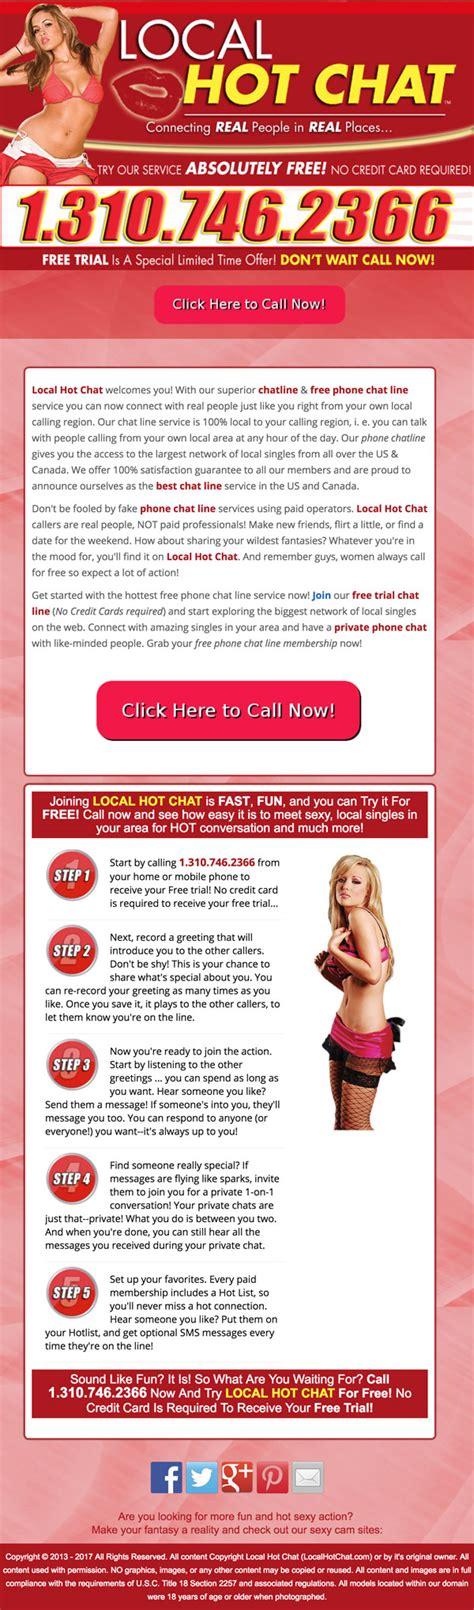 Flirty text girlfriend online dating profile brevno meet the management novartis logo colors tinder pick up lines for guys biological clock psychology